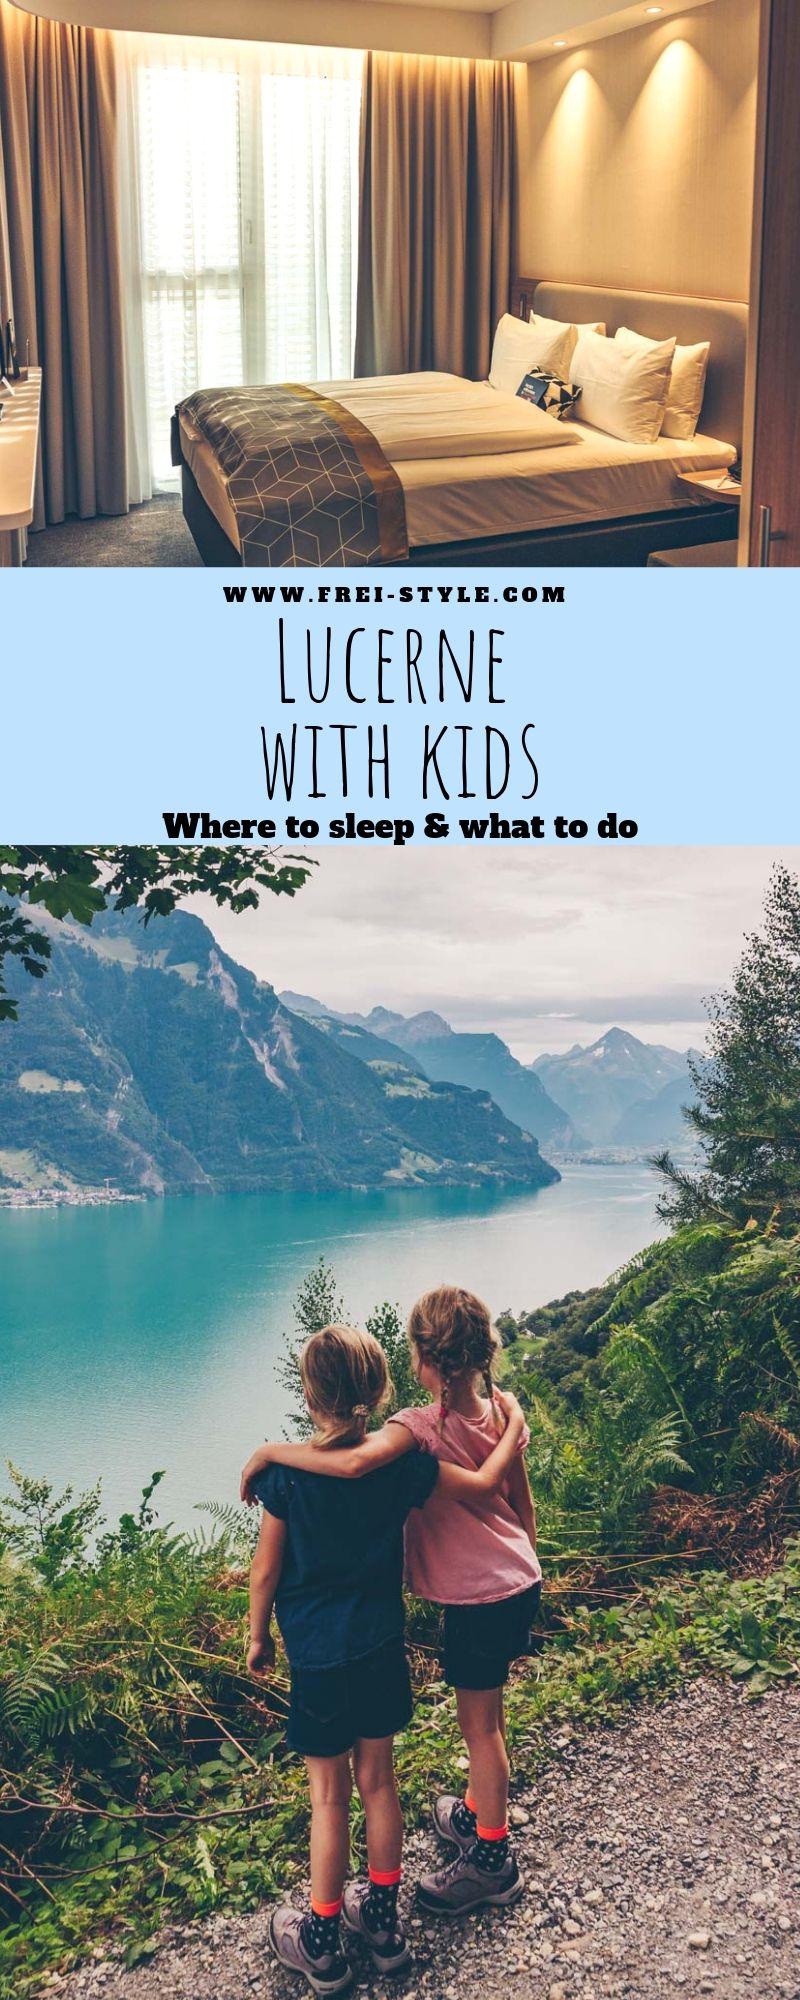 Lucerne with kids